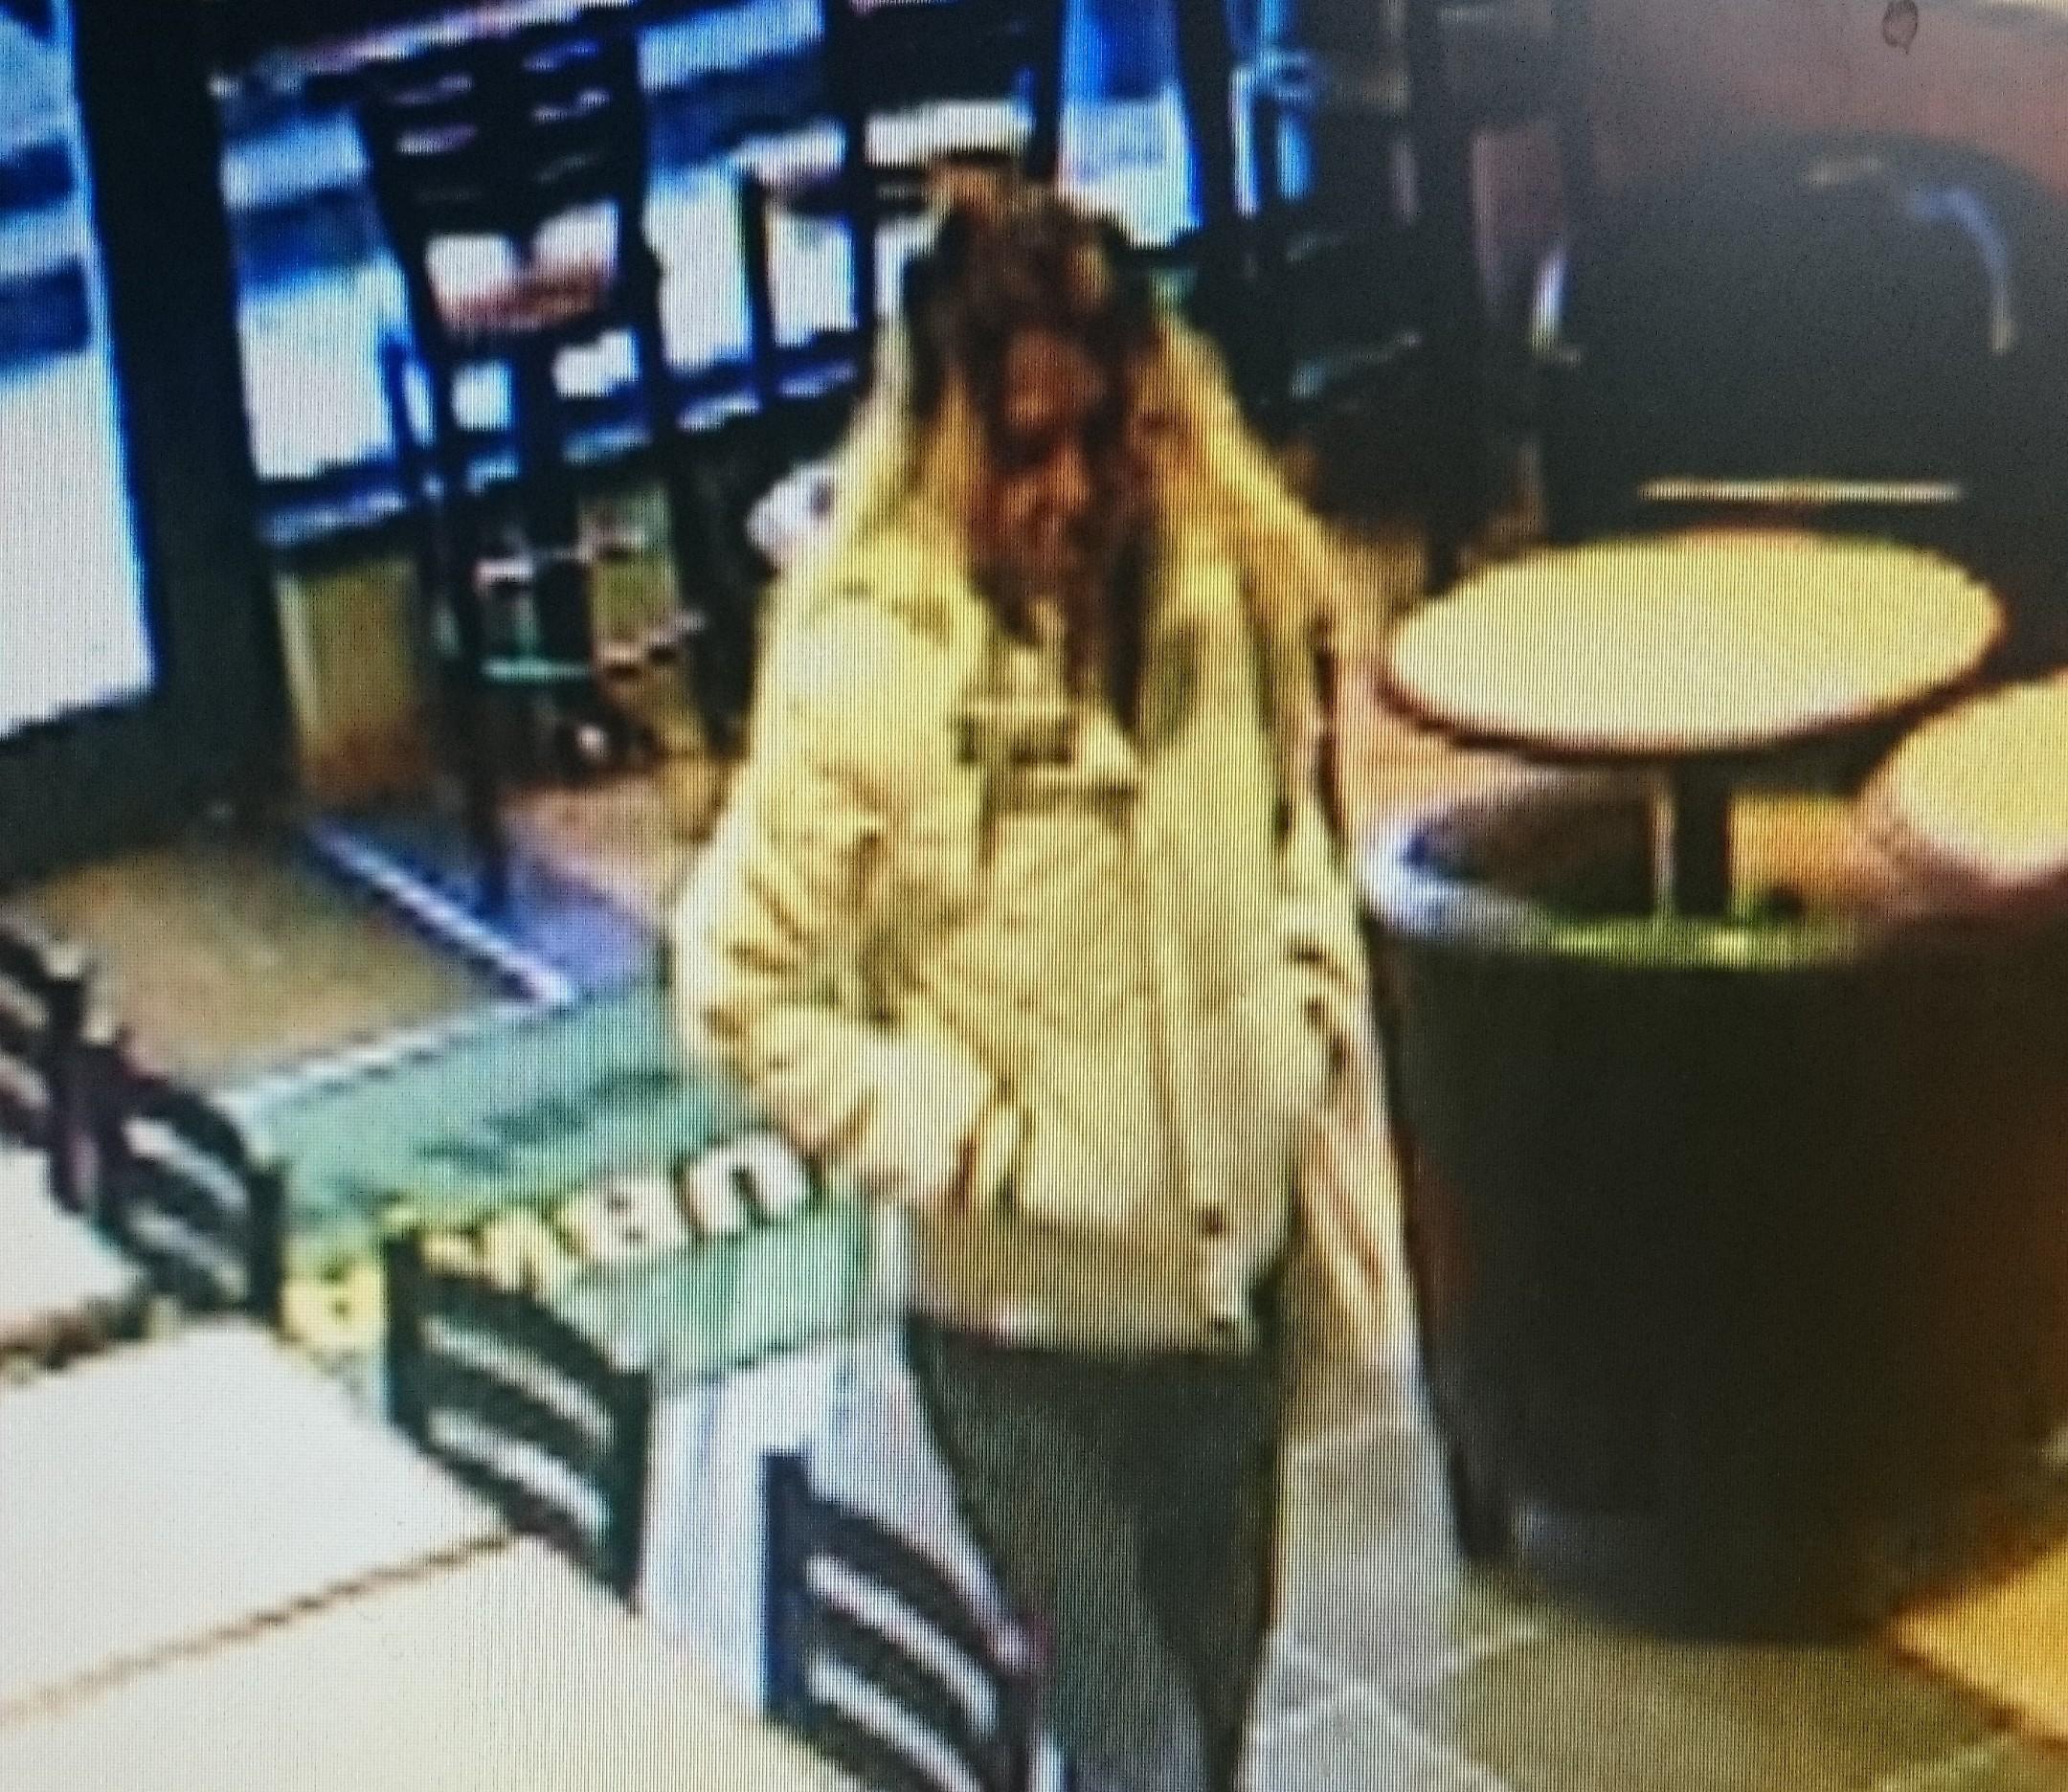 Ms McRae was last seen in the Subway sandwich shop on Montrose High Street